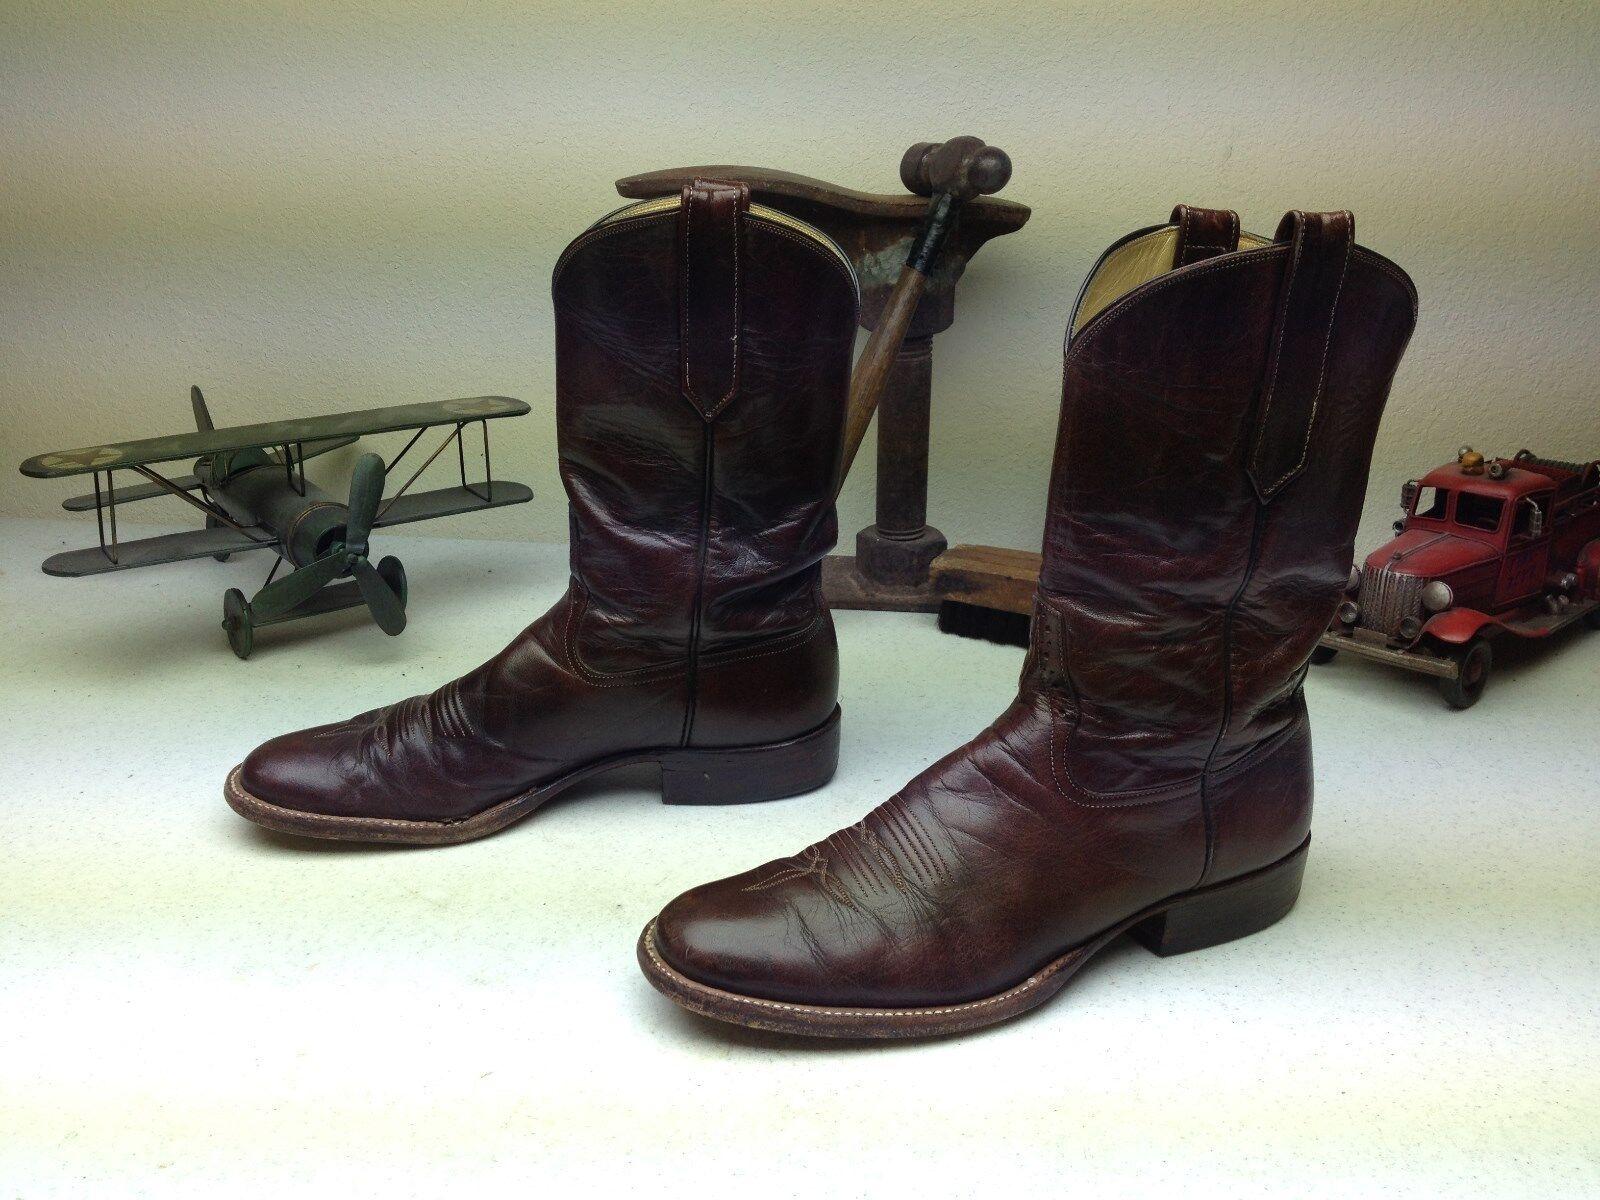 Envejecido rios de Merceds Ingeniero Color occidental de cuero Bota De Cowboy 10,5 A